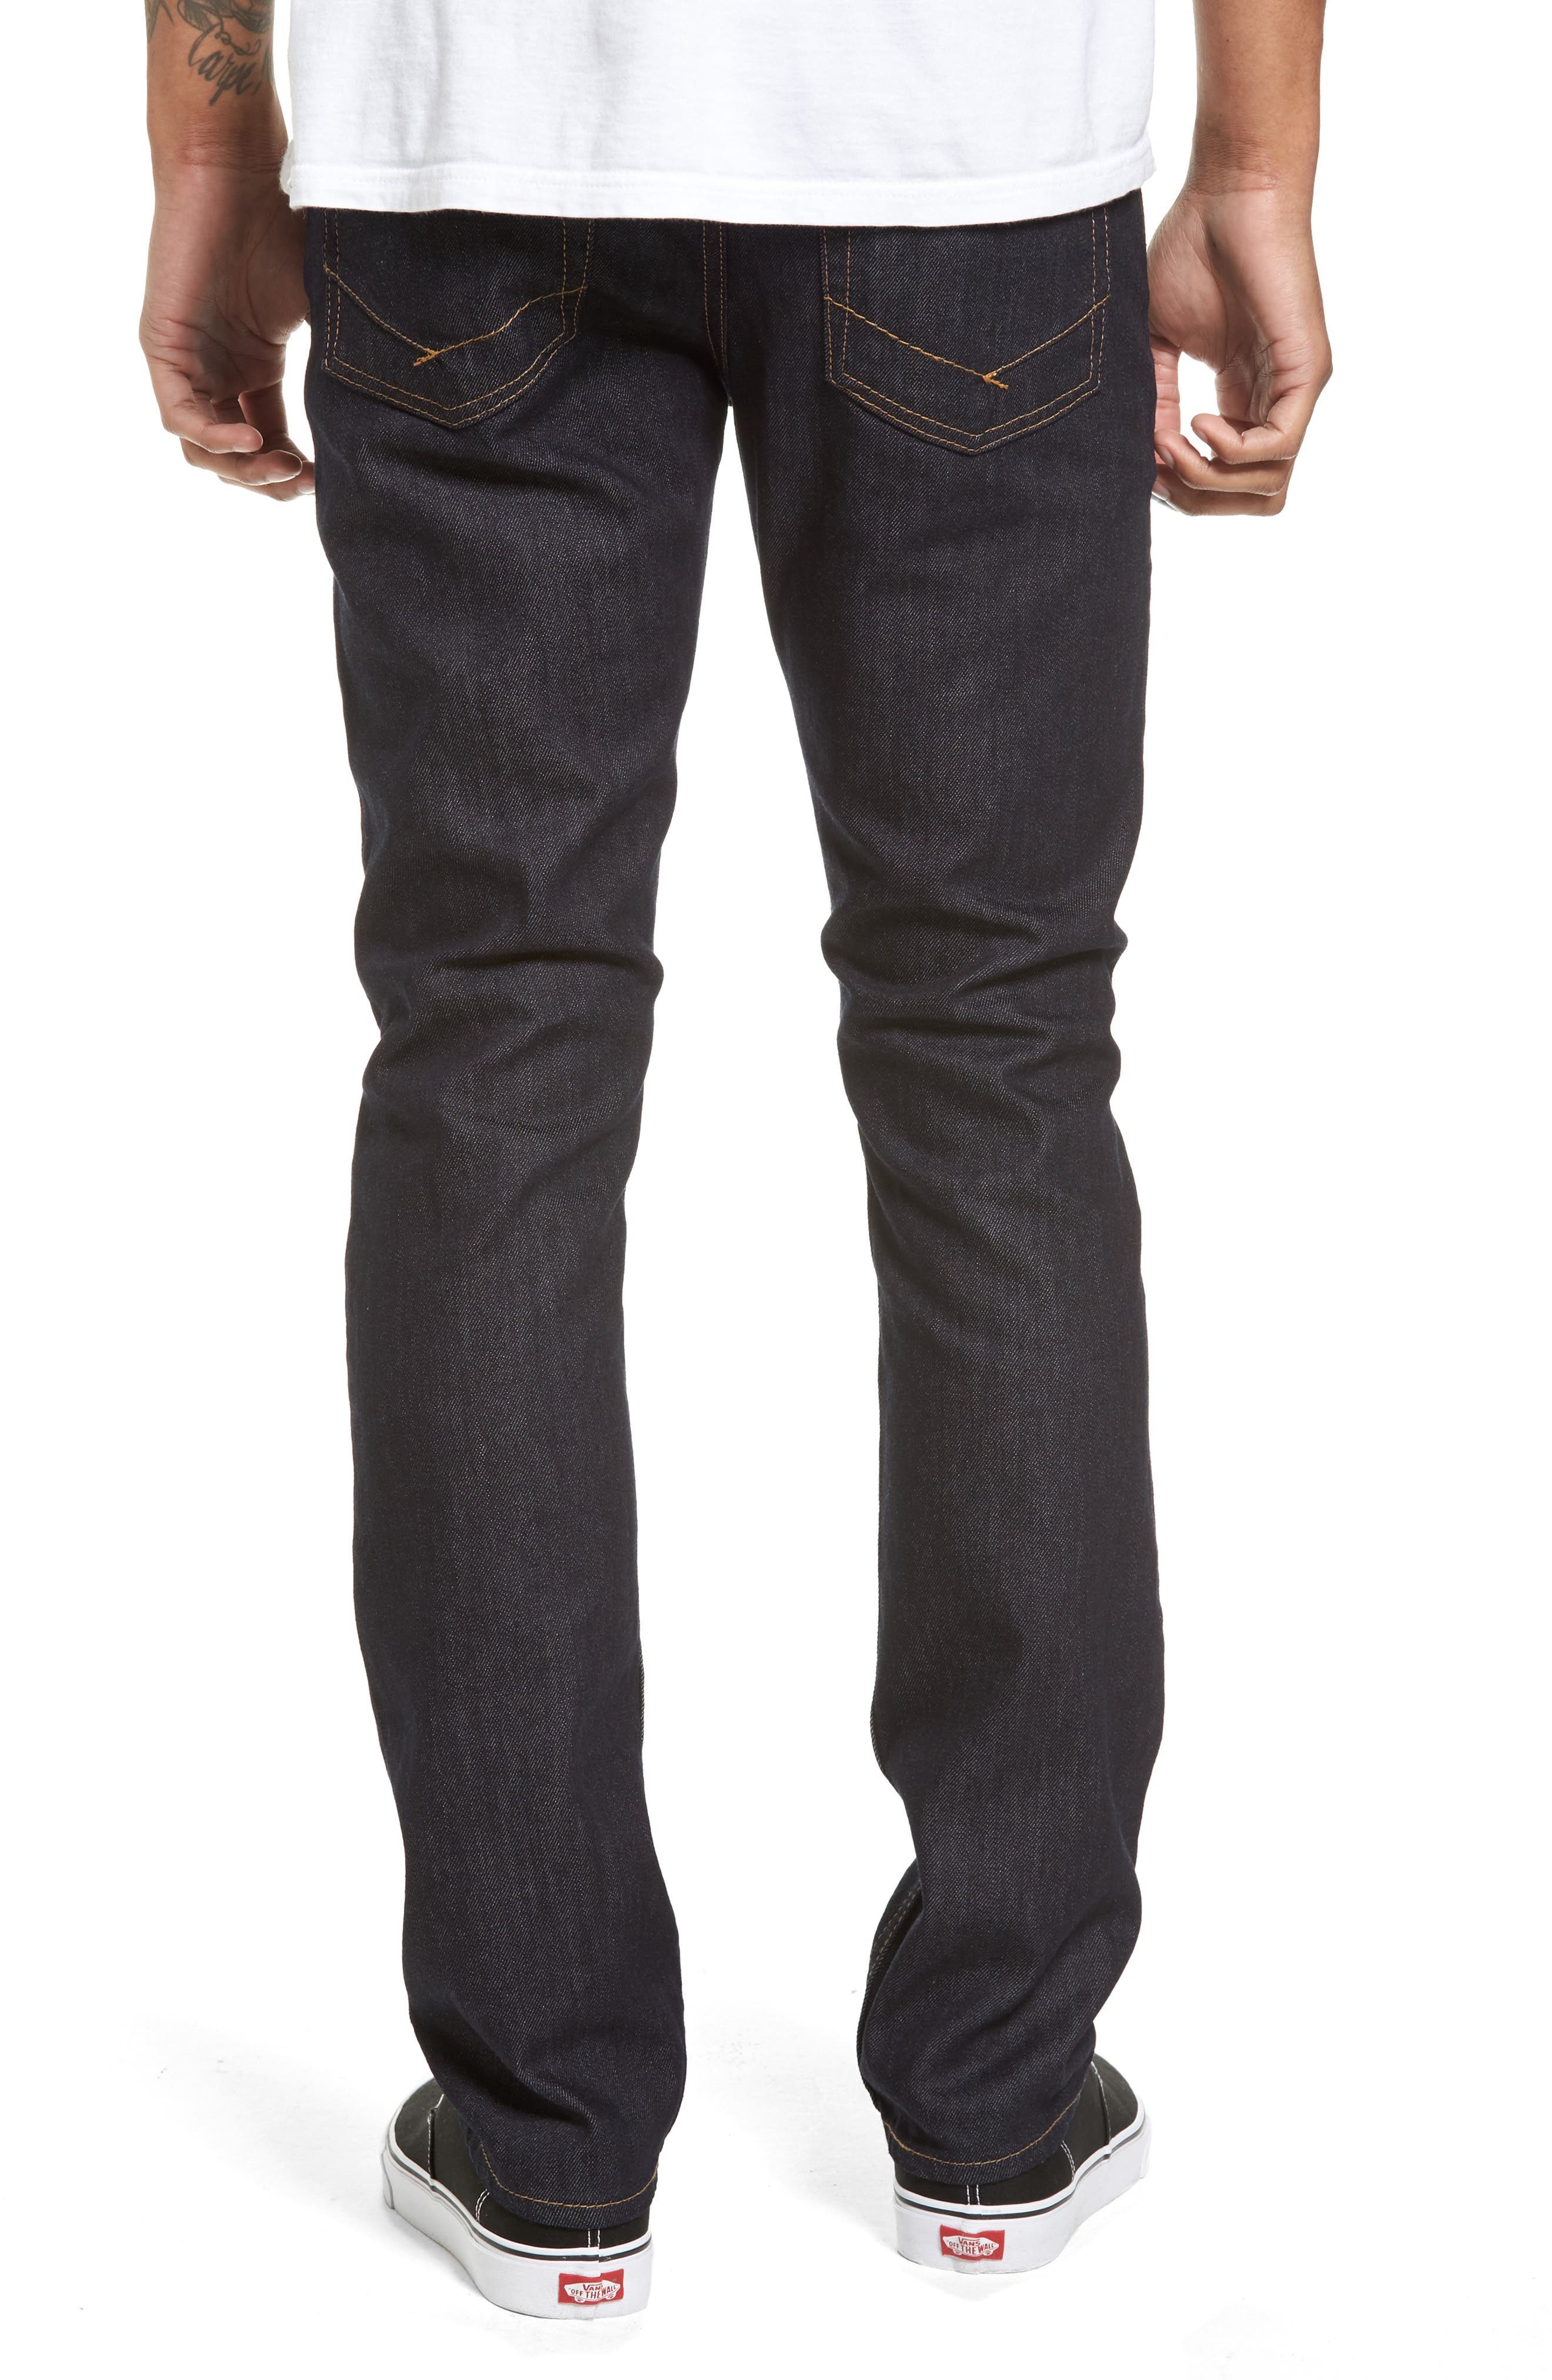 V76 Skinny Jeans,                             Alternate thumbnail 2, color,                             Indigo